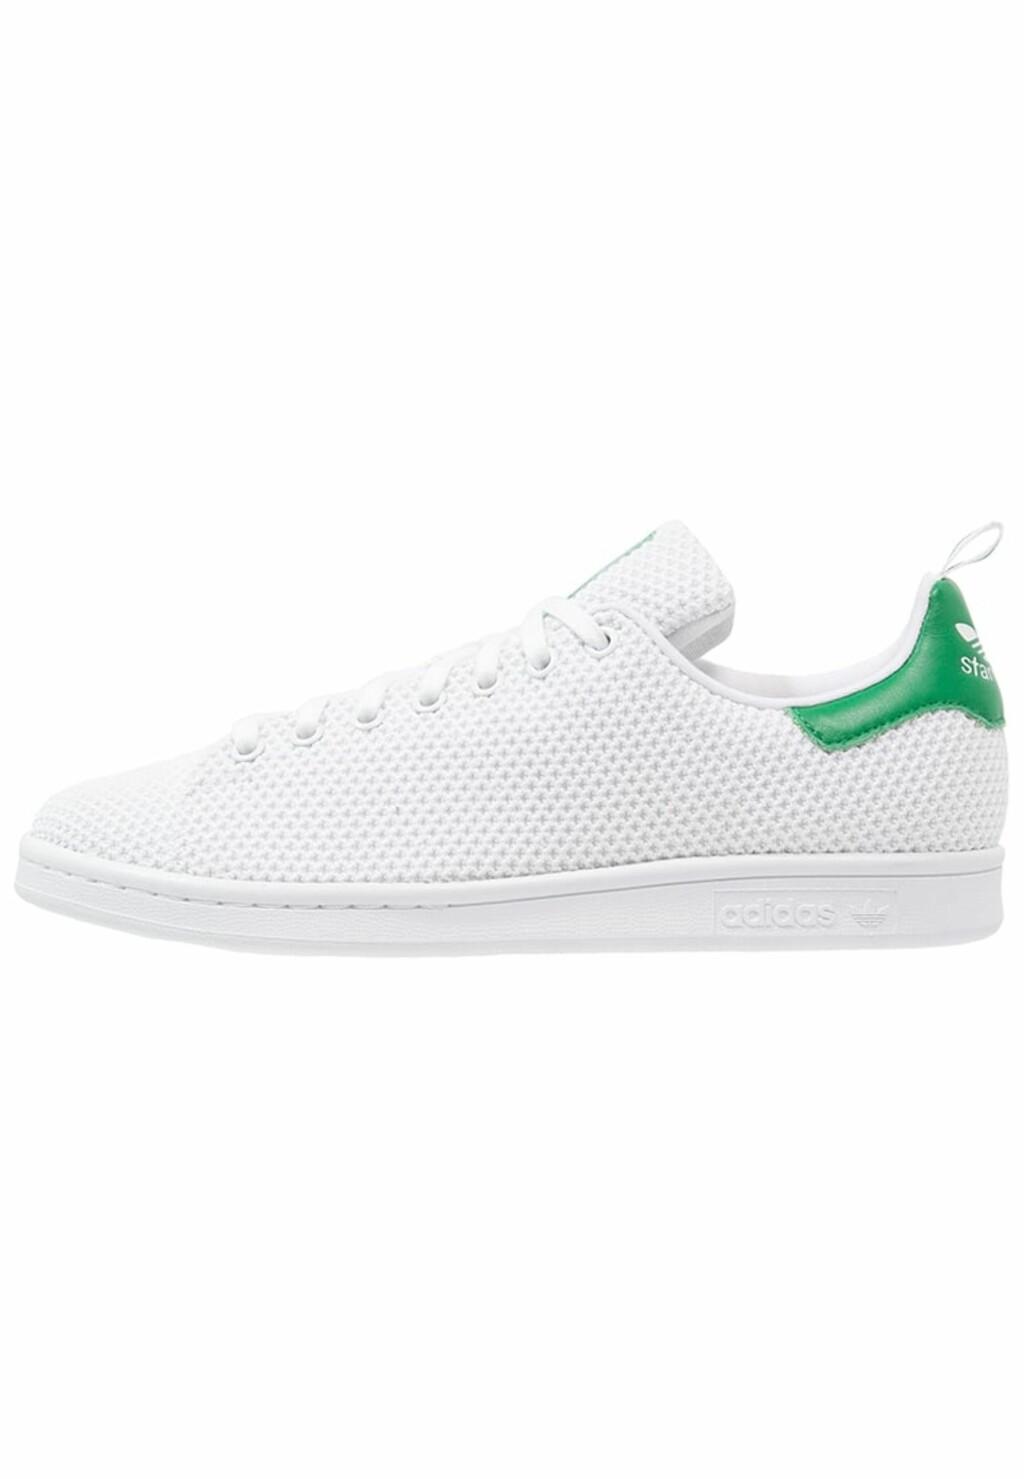 Stan Smith-sneakers fra Adidas med grønn detalj bak via Zalando.no   kr 949